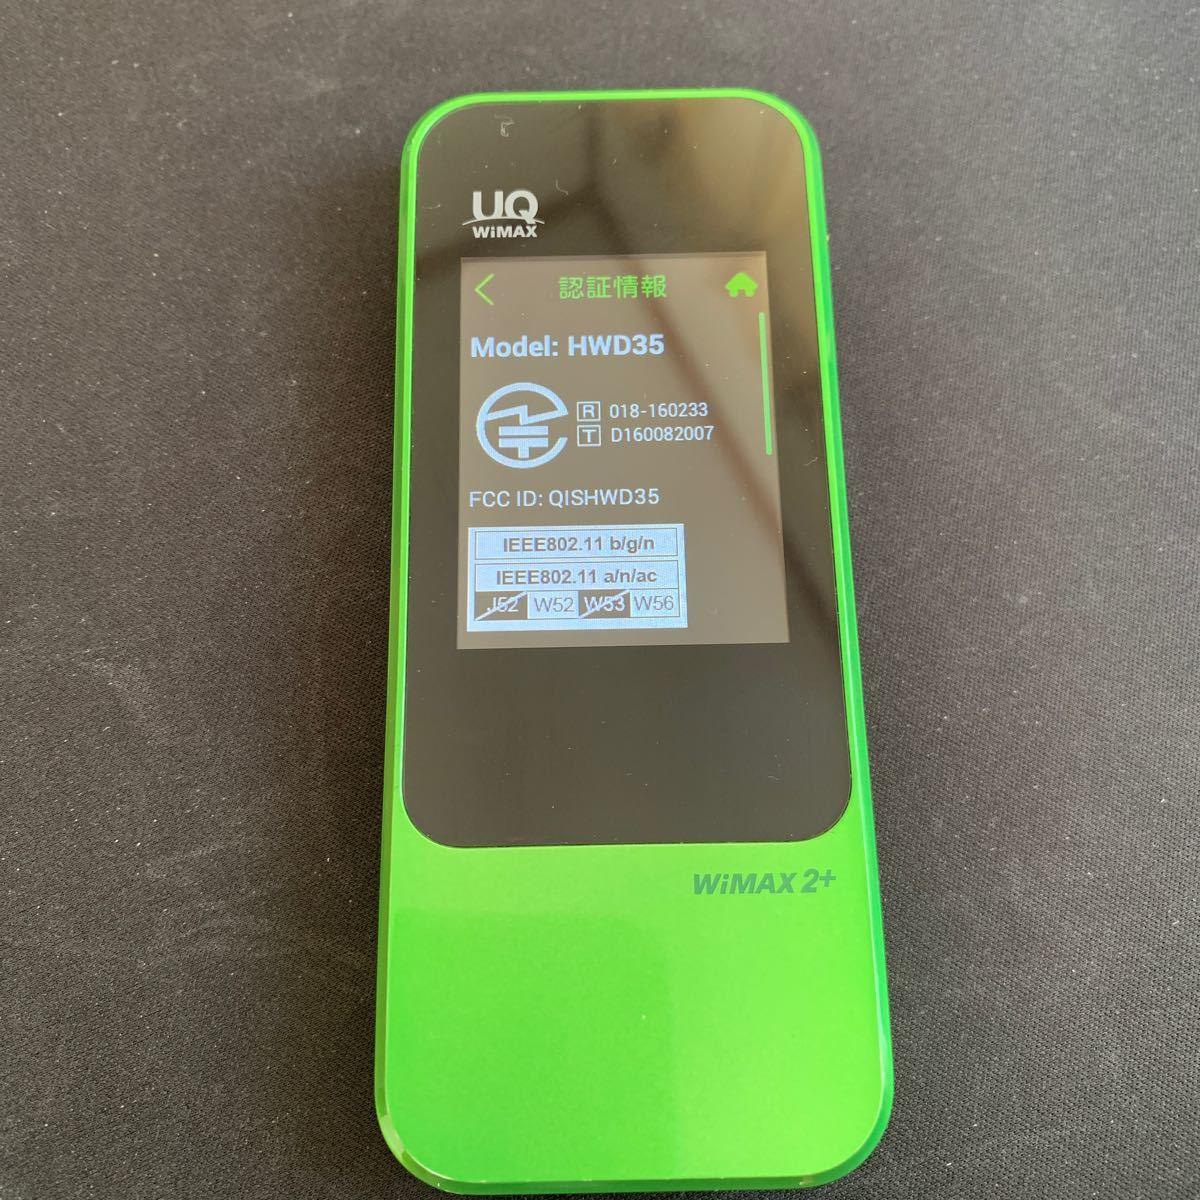 WiMAX2+ SPEED Wi-Fi NEXT W04 UQ HWD35